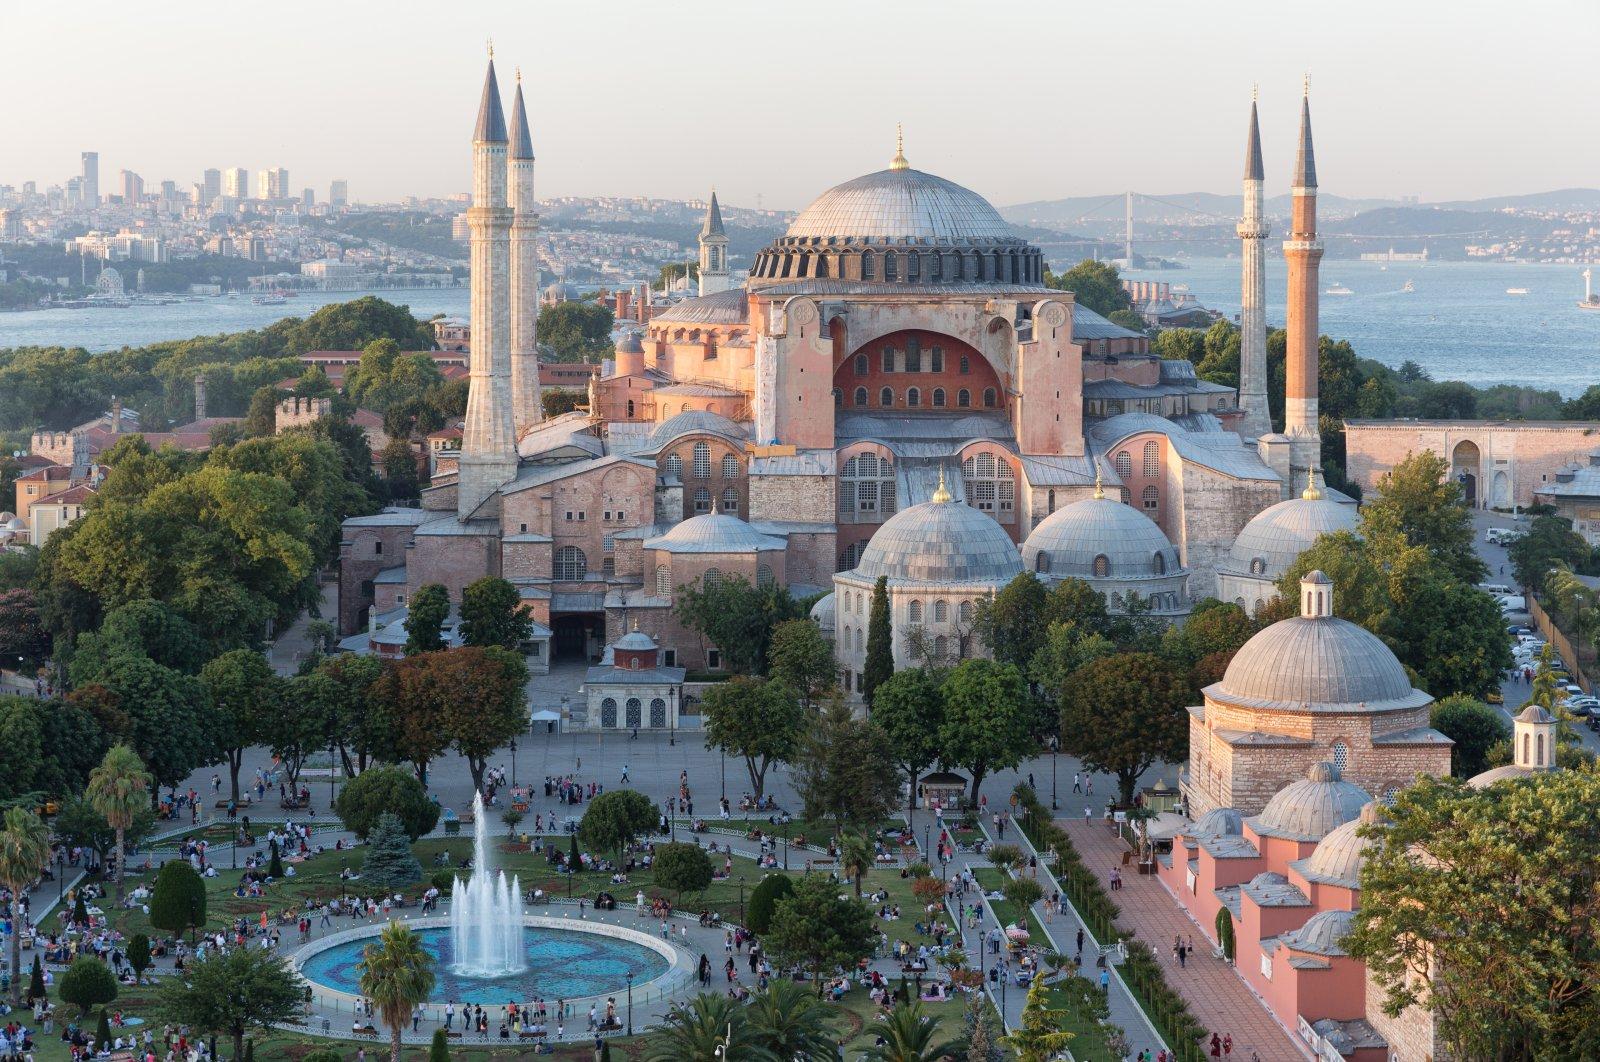 An aeriel shot of Hagia Sophia Grand Mosque in Turkey's Istanbul. (Shutterstock Photo)